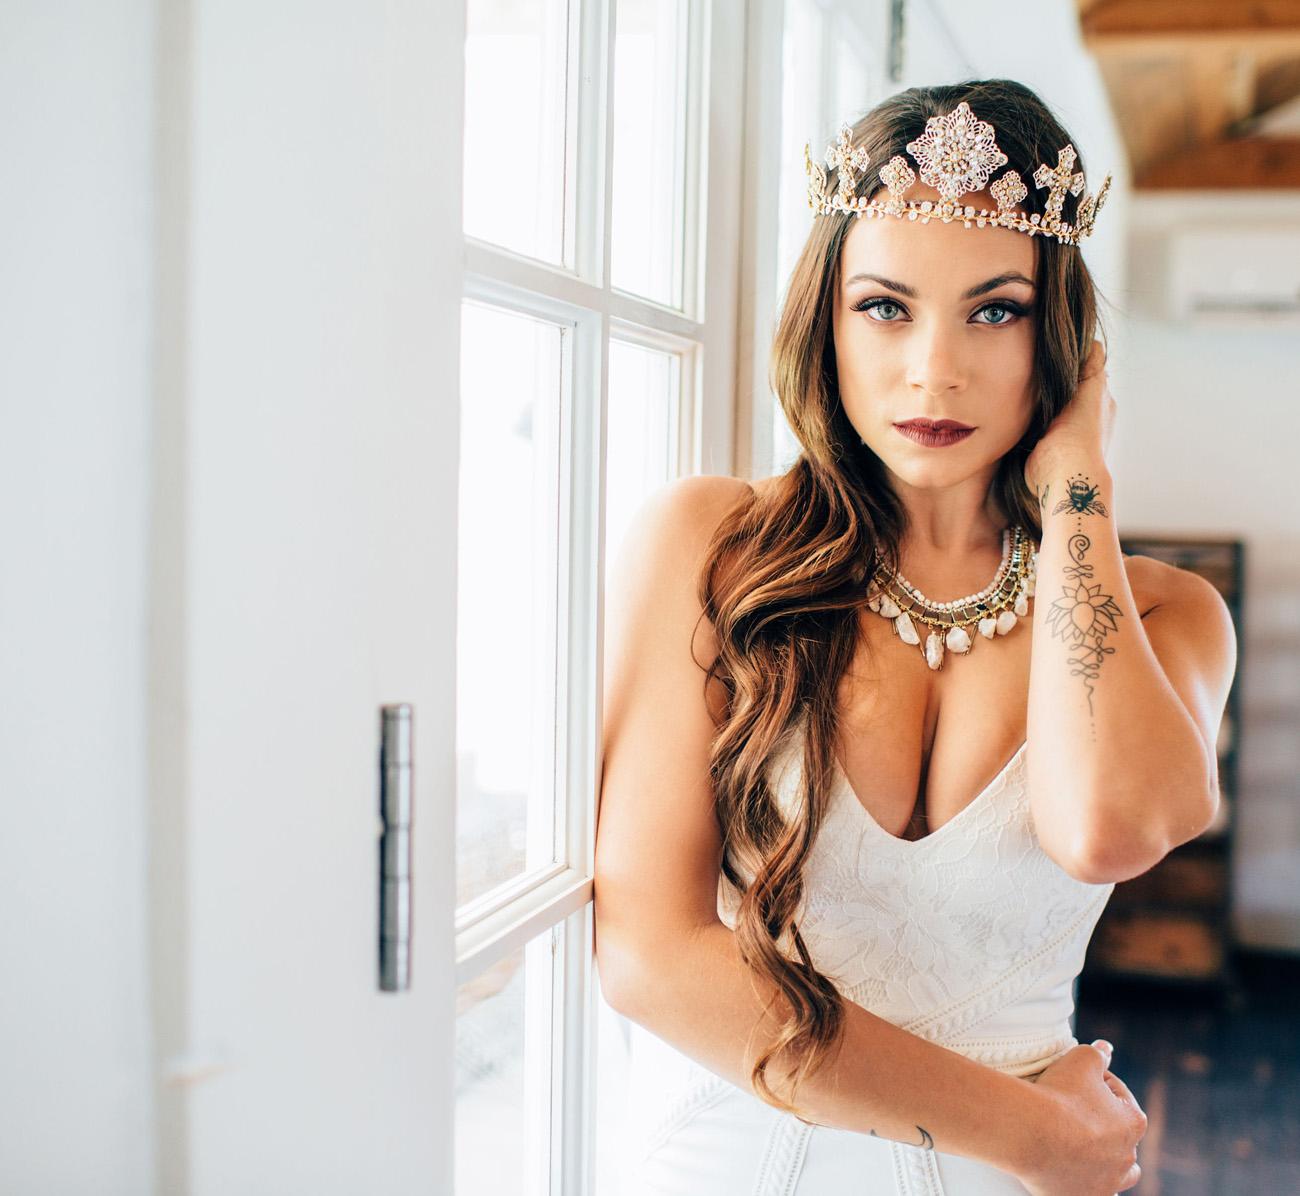 Wyatt Wedding Dress with Crown